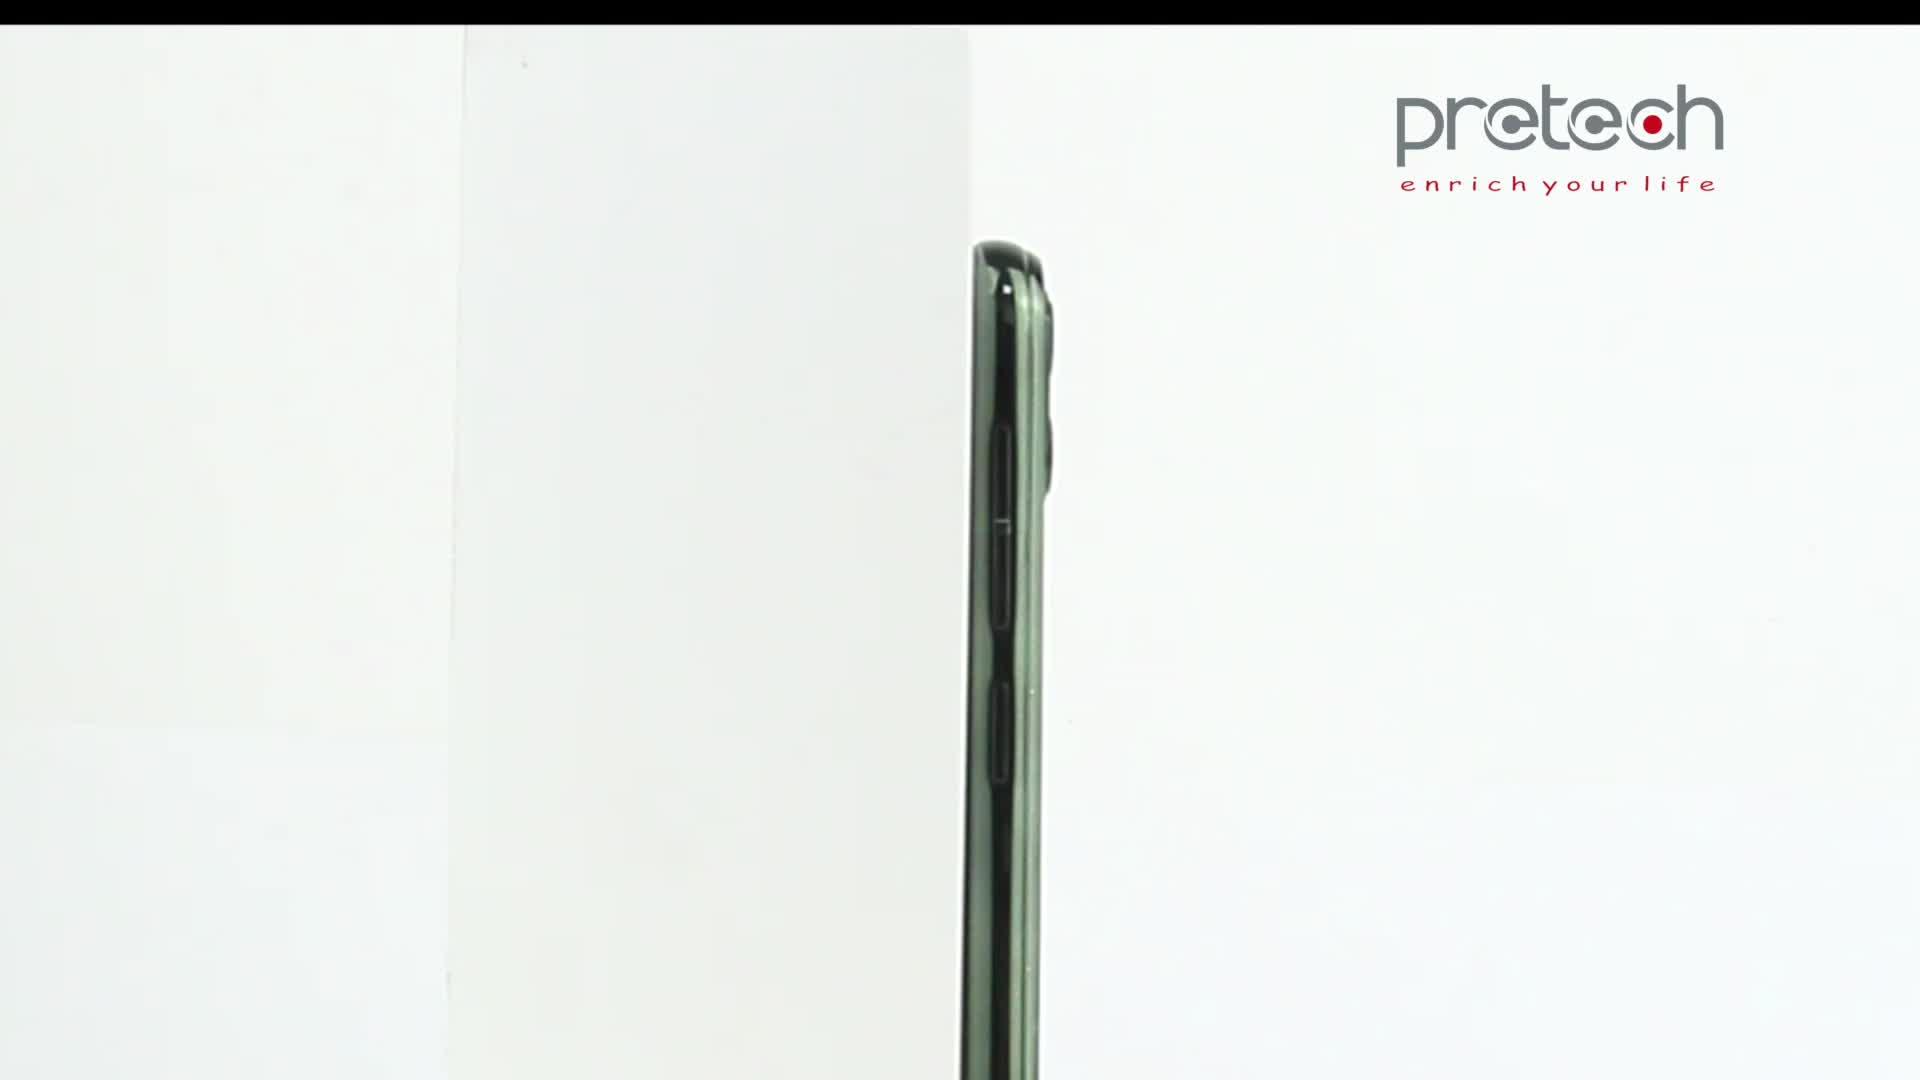 OEM ODM Smartphone China 5.7inch 4G Smartphone Smartphones Phones Unlocked